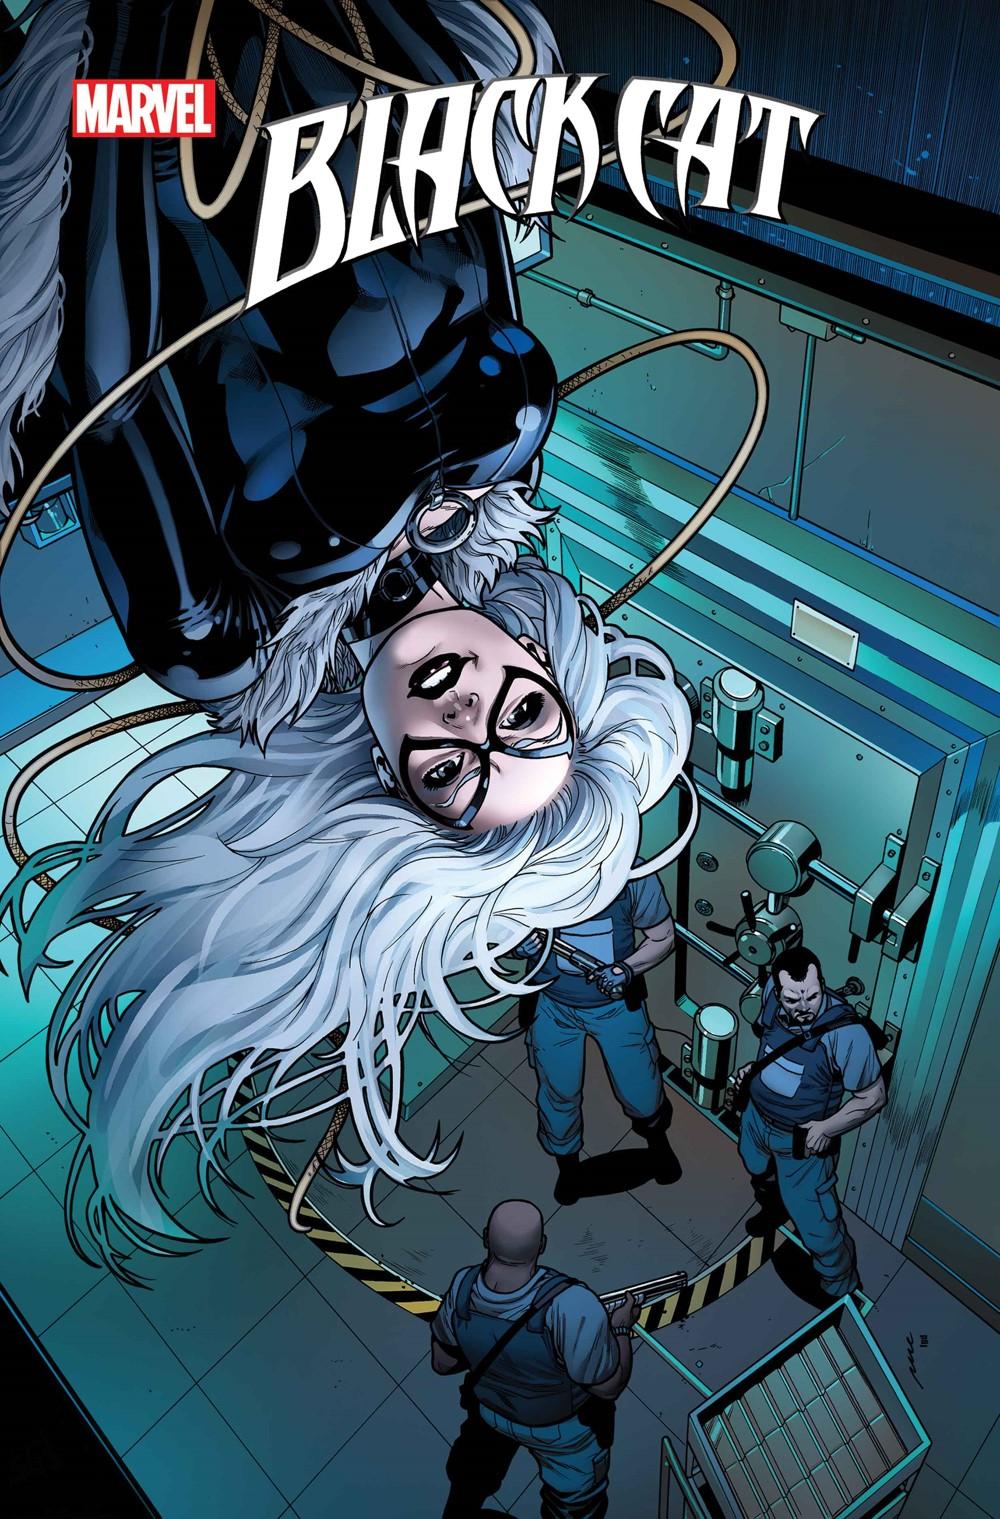 BLACKCAT2020010_Perez_VAR Marvel Comics September 2021 Solicitations